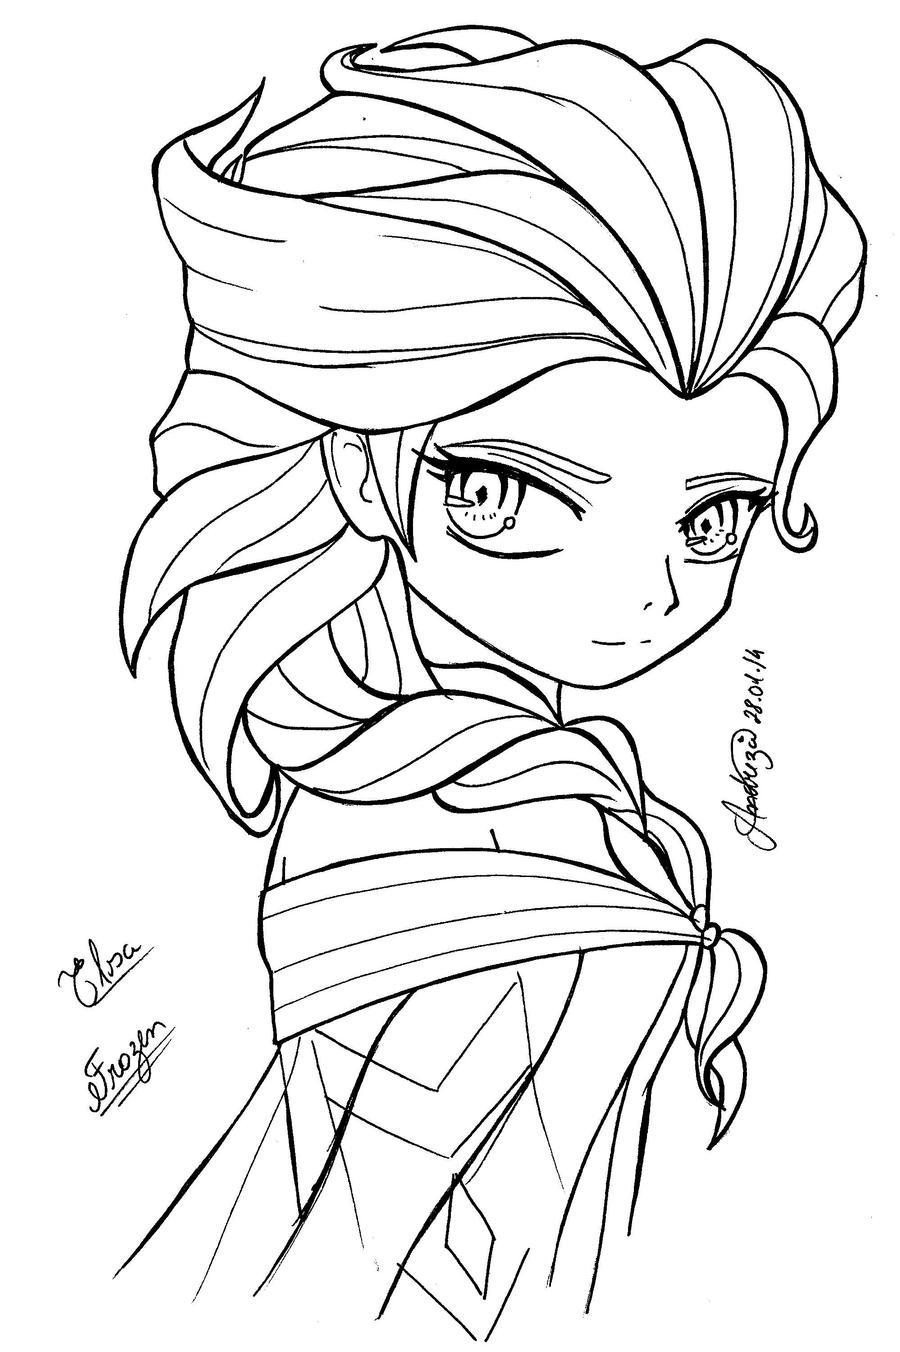 Coloring pages queen elsa - Queen Elsa Frozen By Tifayuy